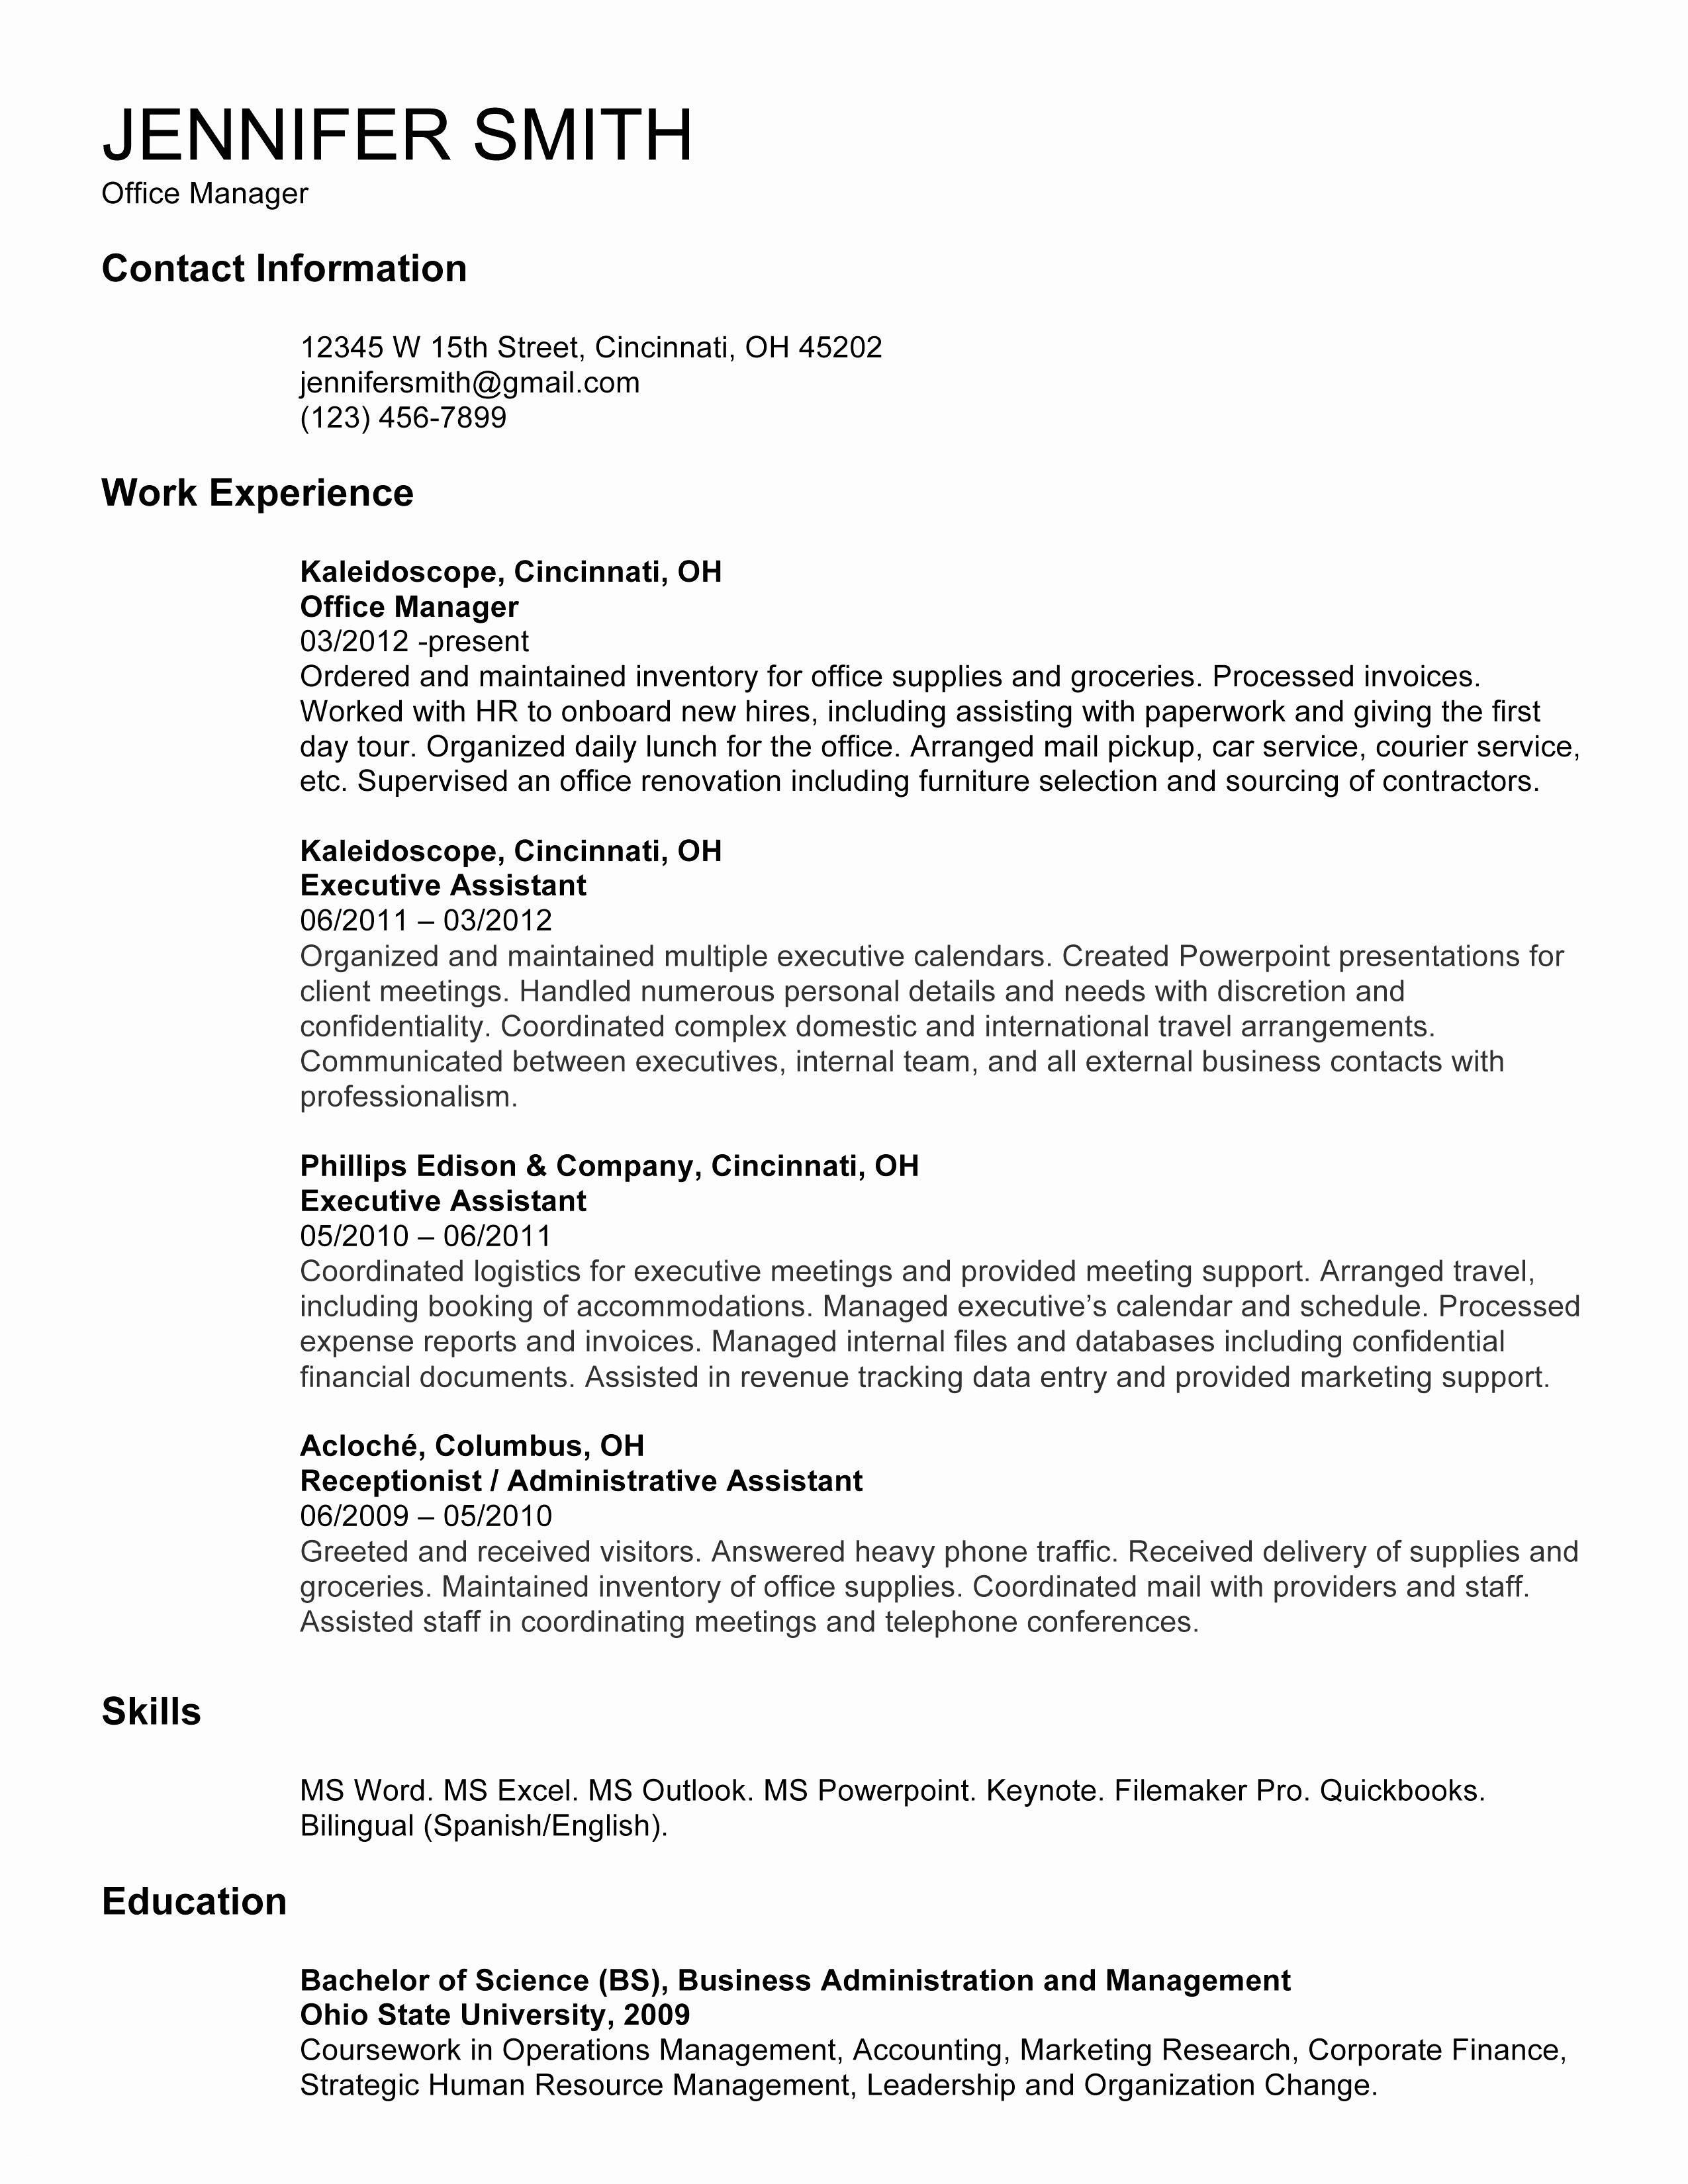 Human Resource Resume Template